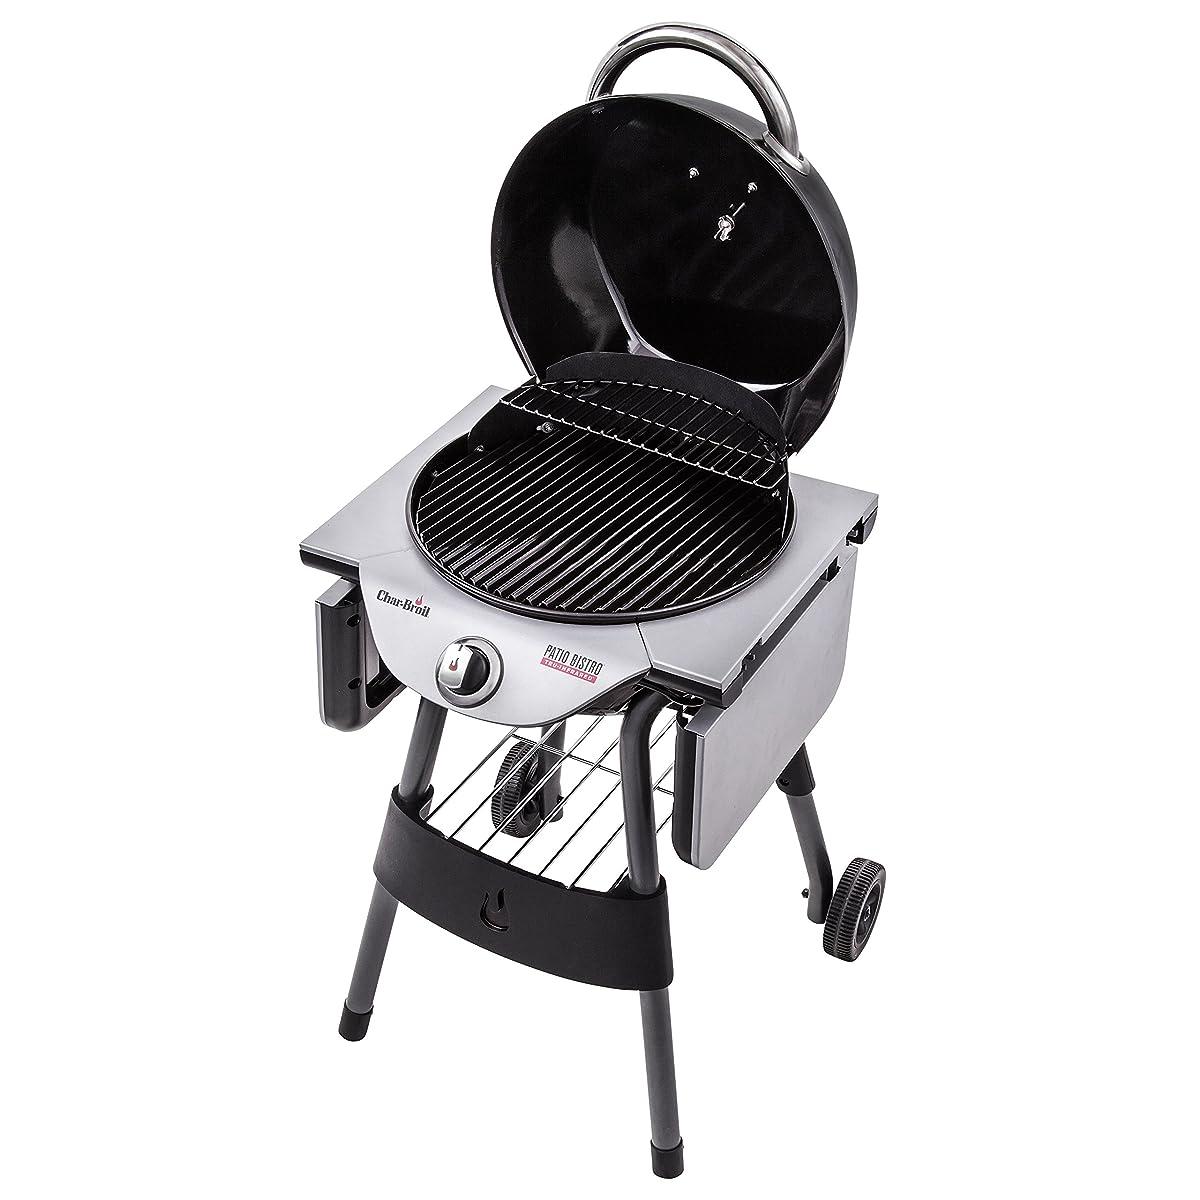 Char Broil 17602048 TRU Infrared Patio Bistro Electric Grill, Black